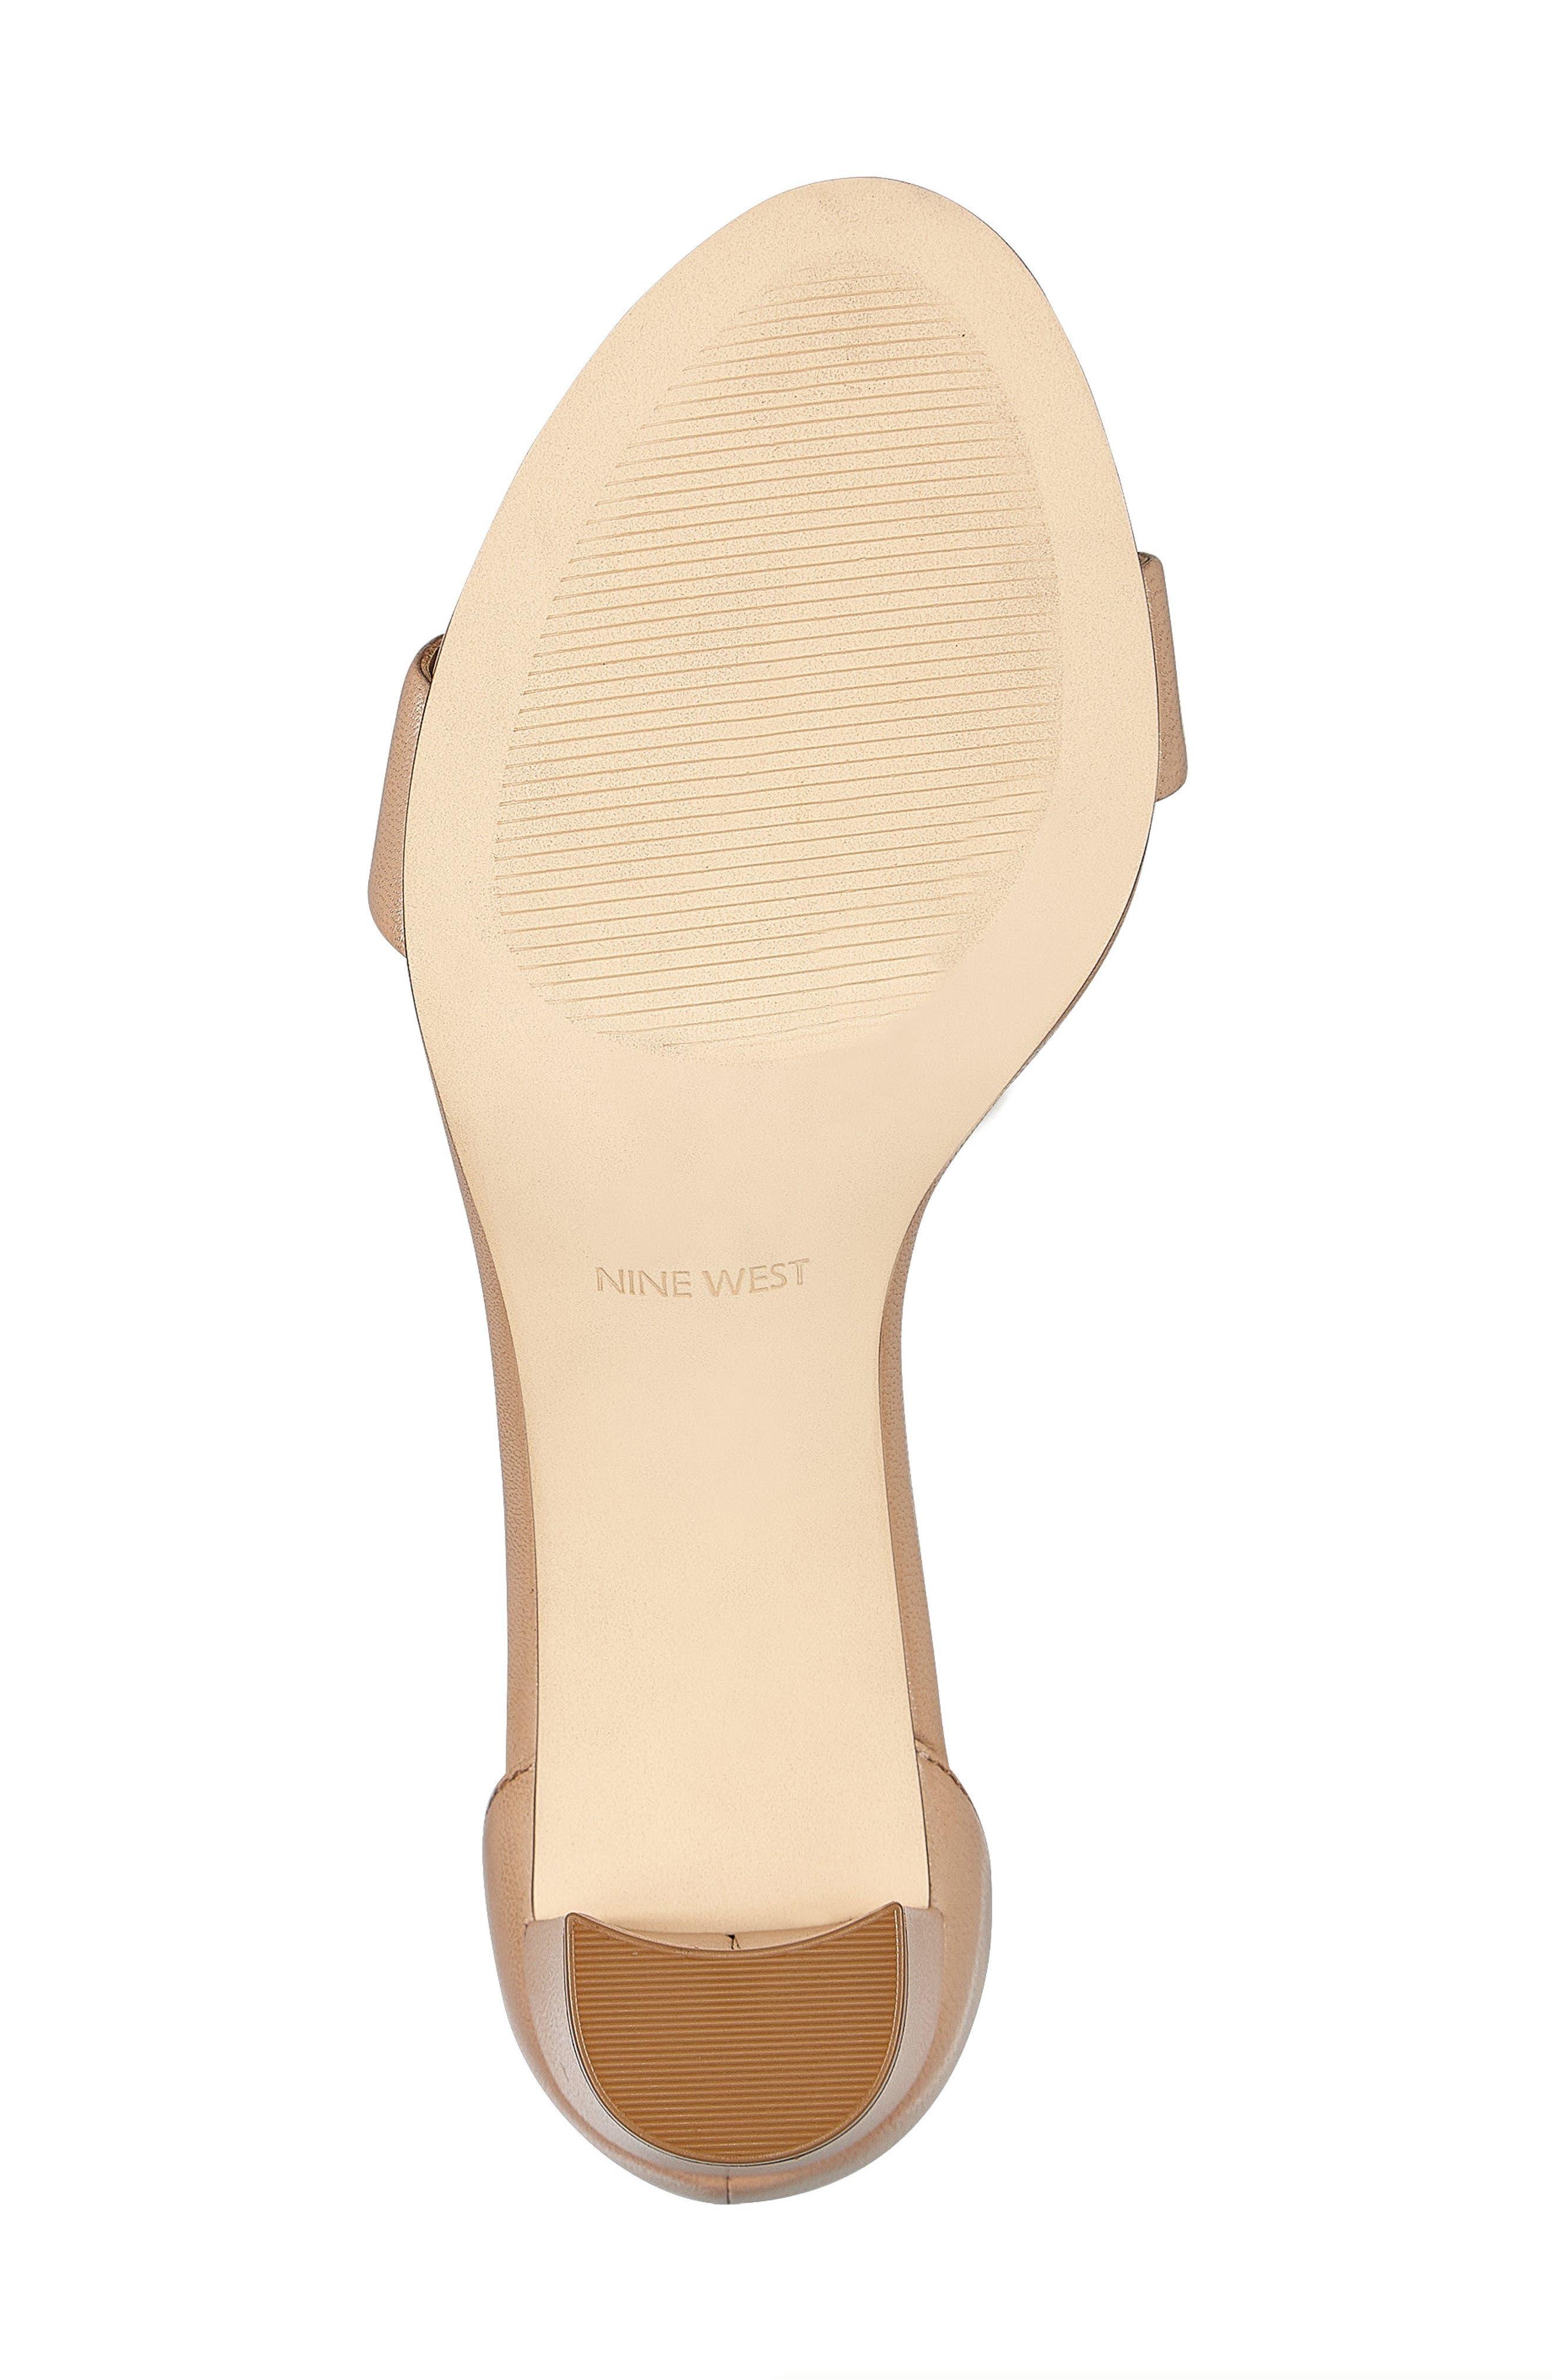 Pruce Ankle Strap Sandal,                             Alternate thumbnail 6, color,                             LIGHT NATURAL LEATHER